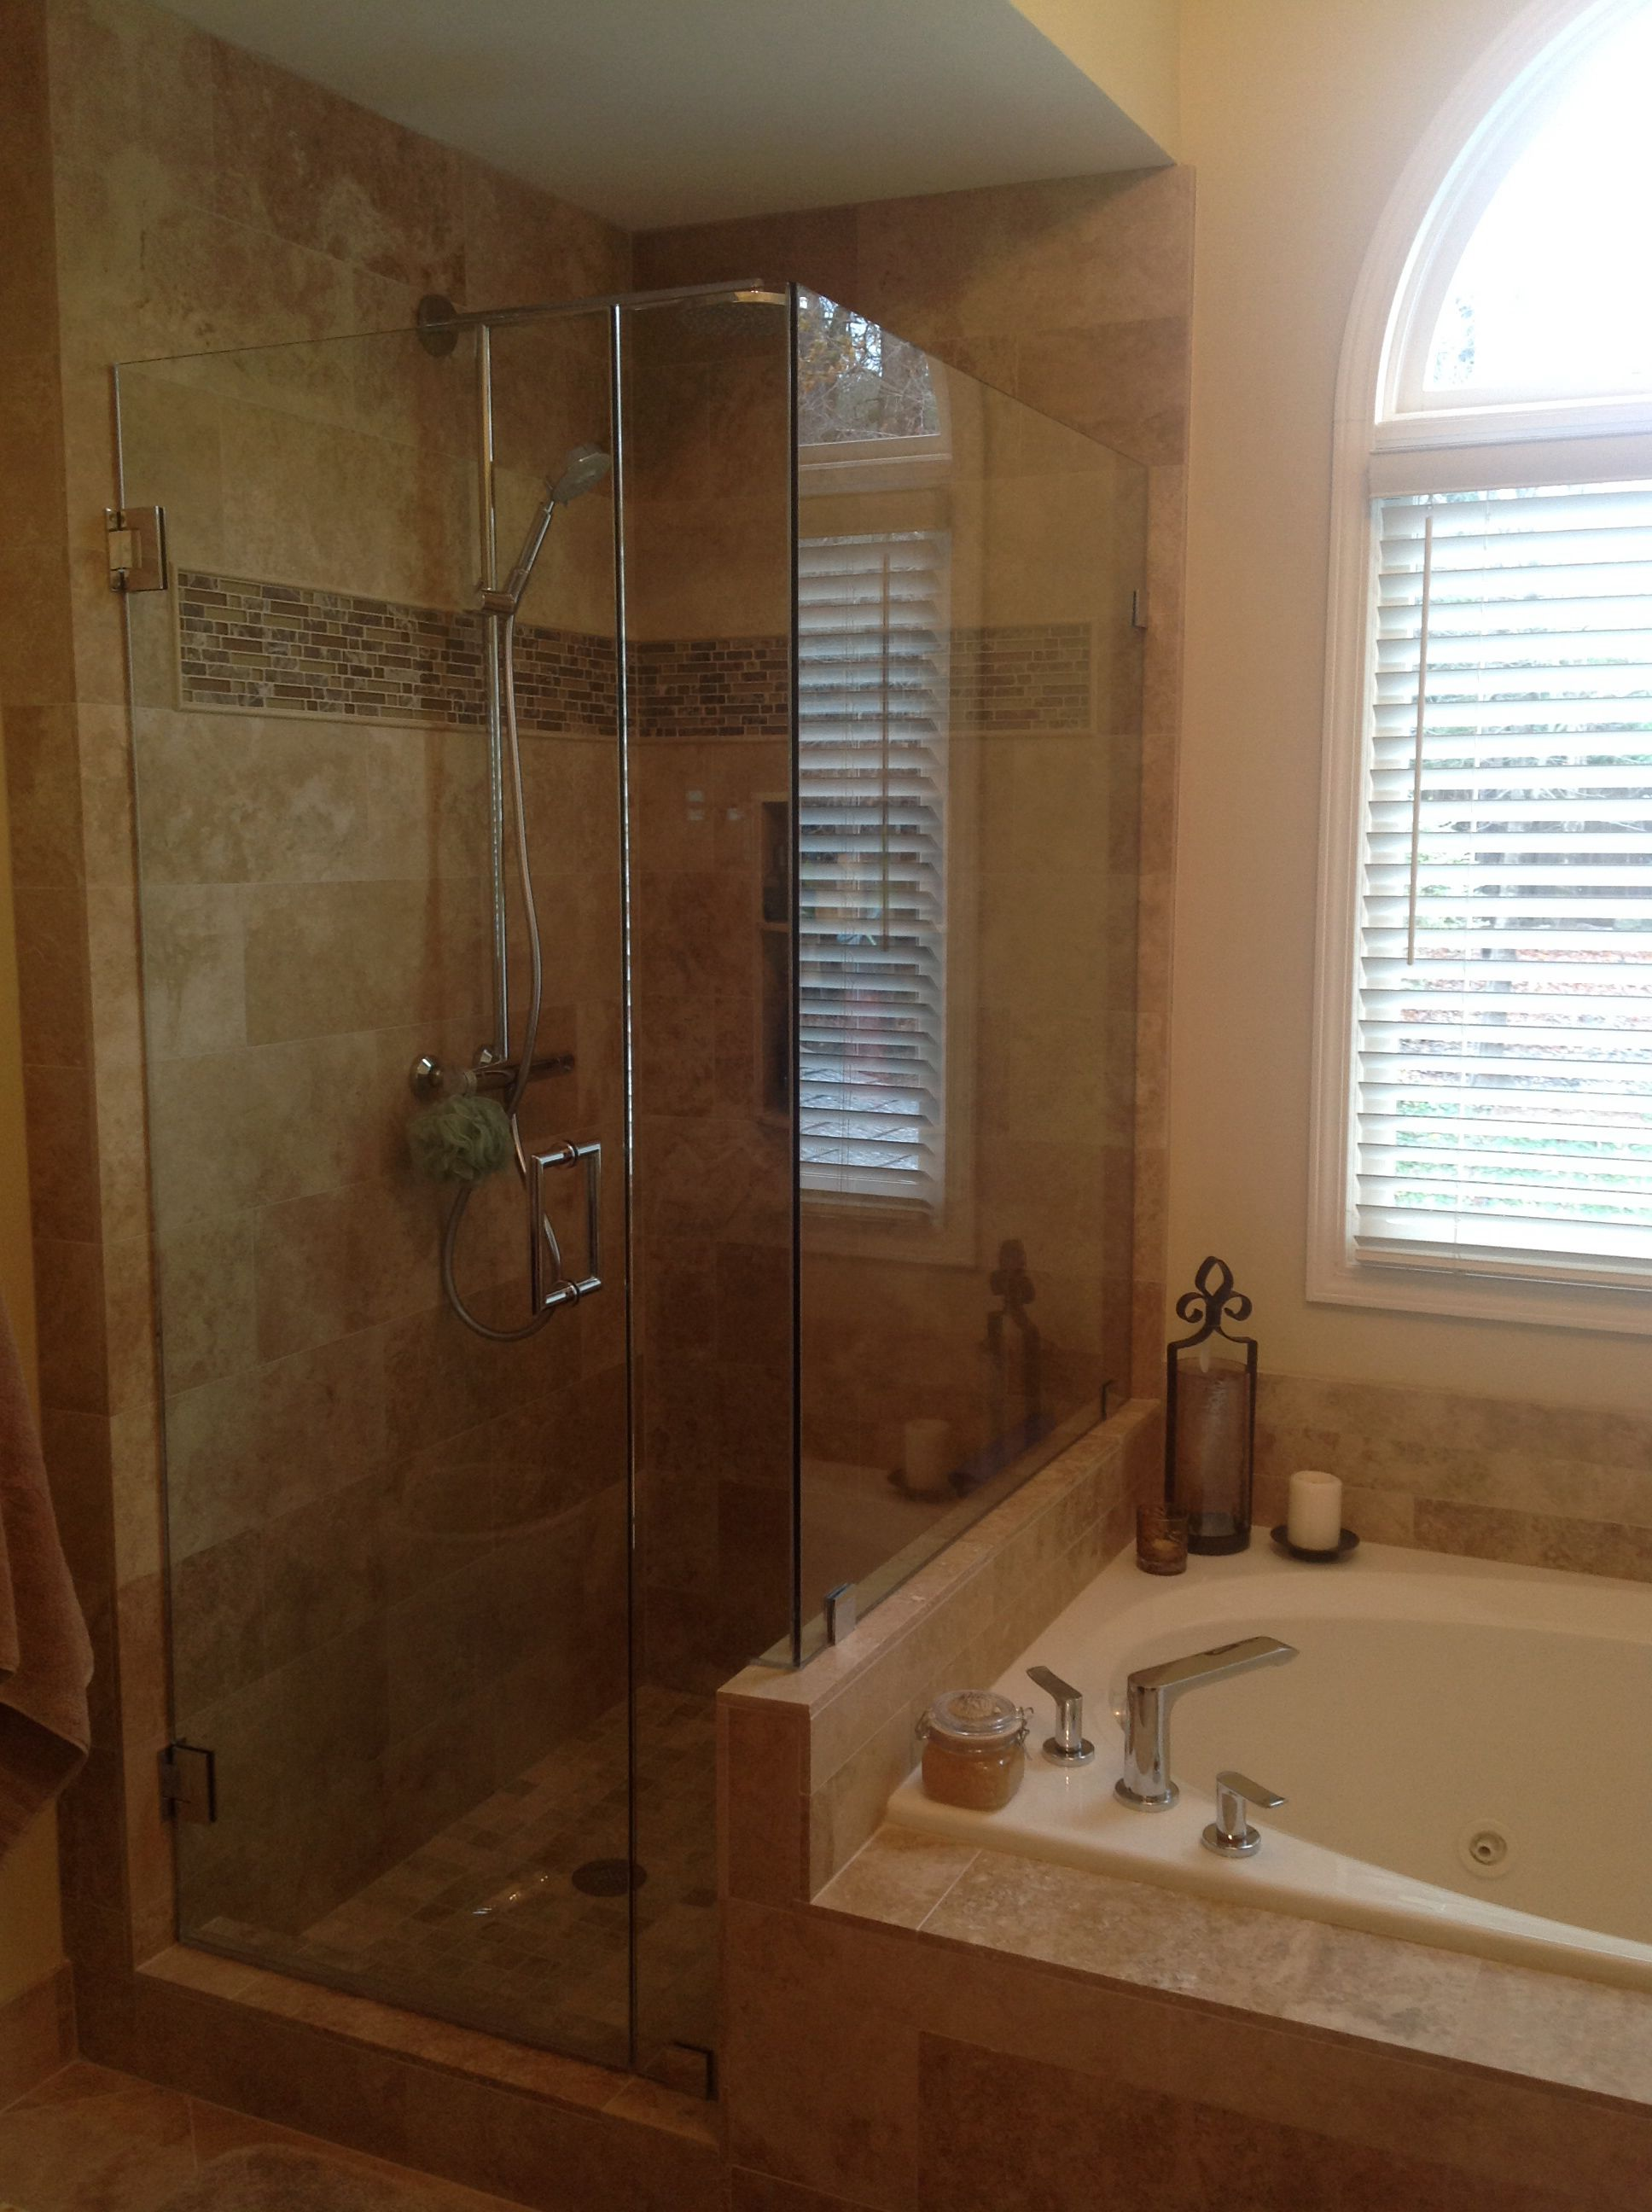 bathroom stone kitchen ivory floor backsplash ideas travertine design natural tiles wall tile